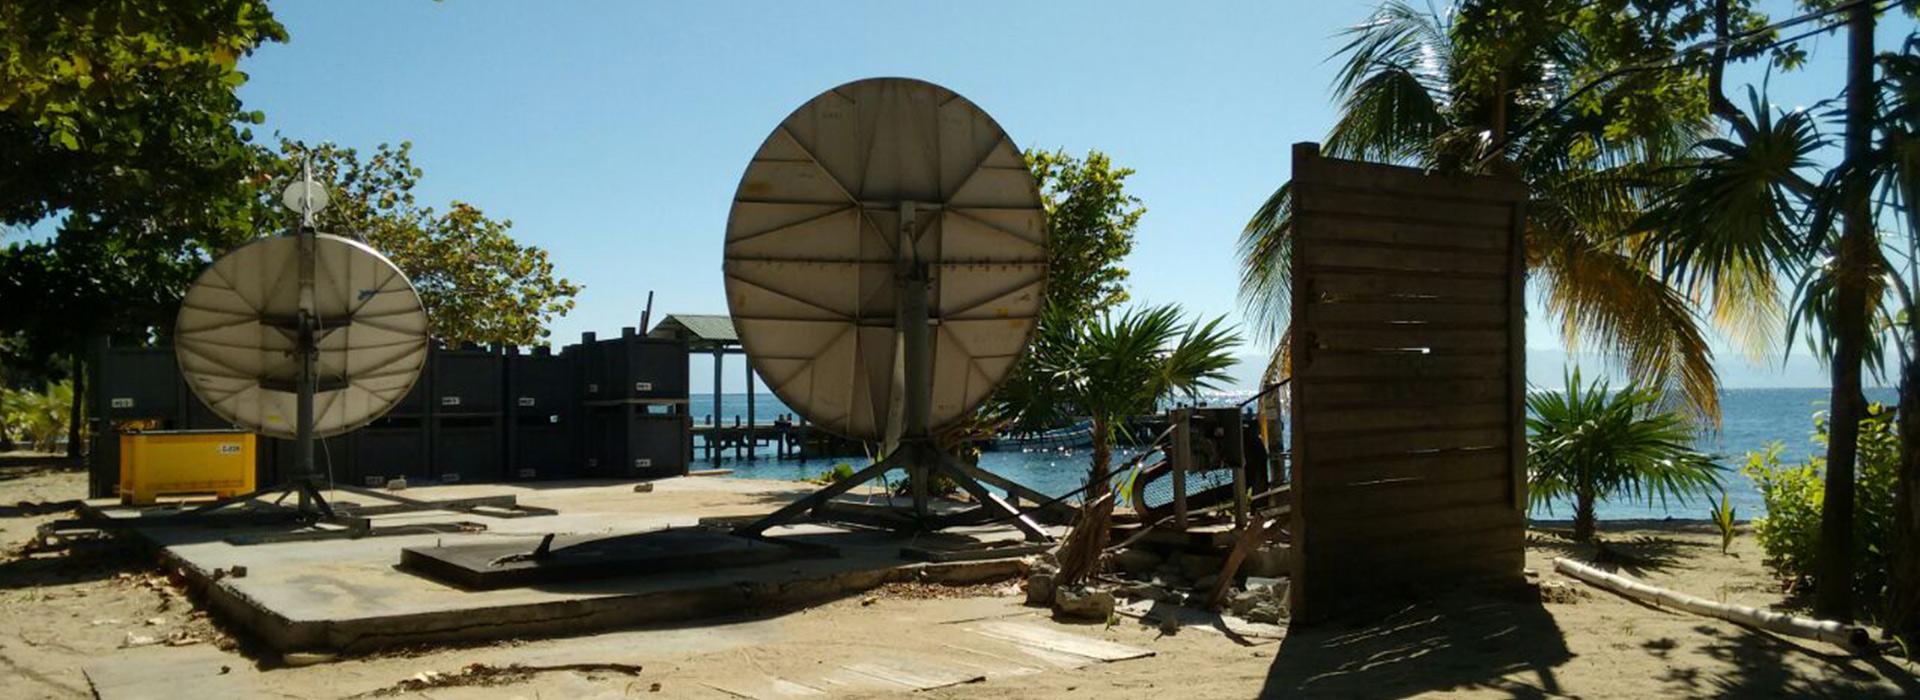 Riprese televisive satellitari